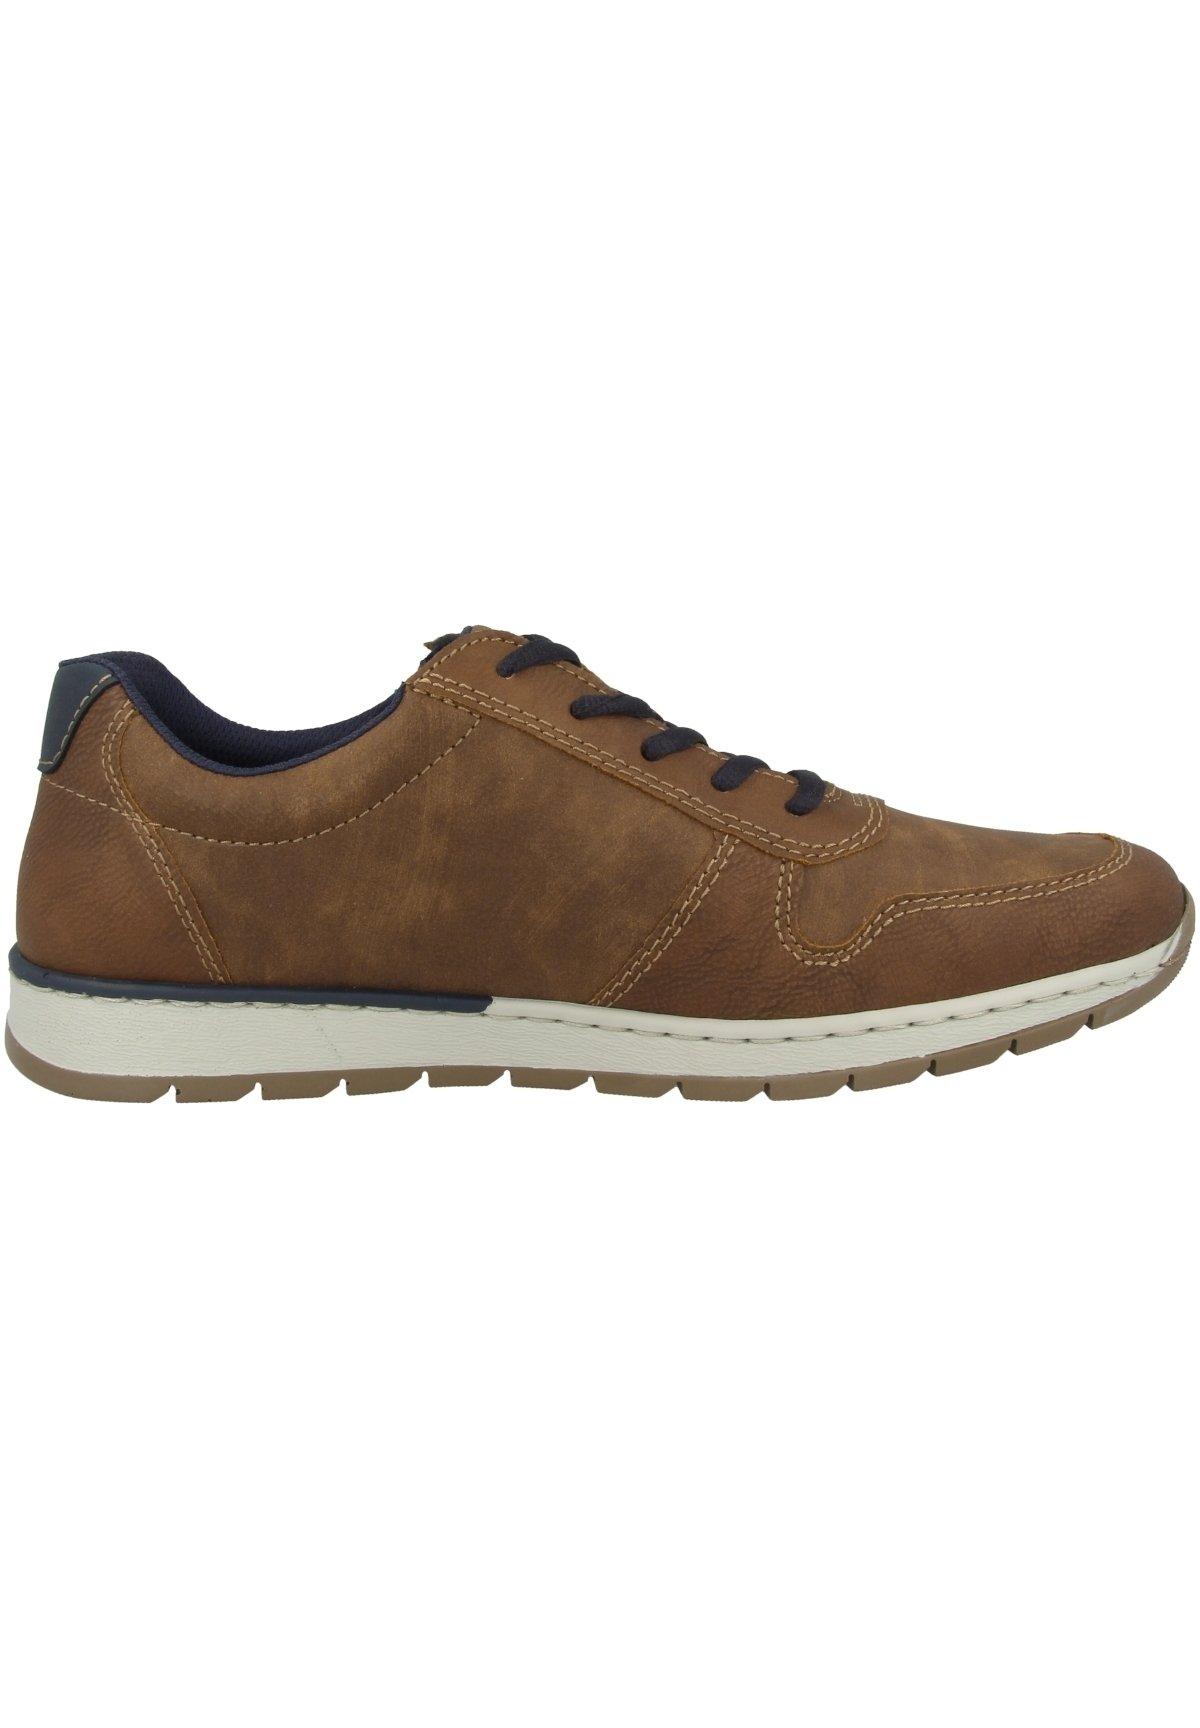 Rieker Sneaker low brown (b2114 24)